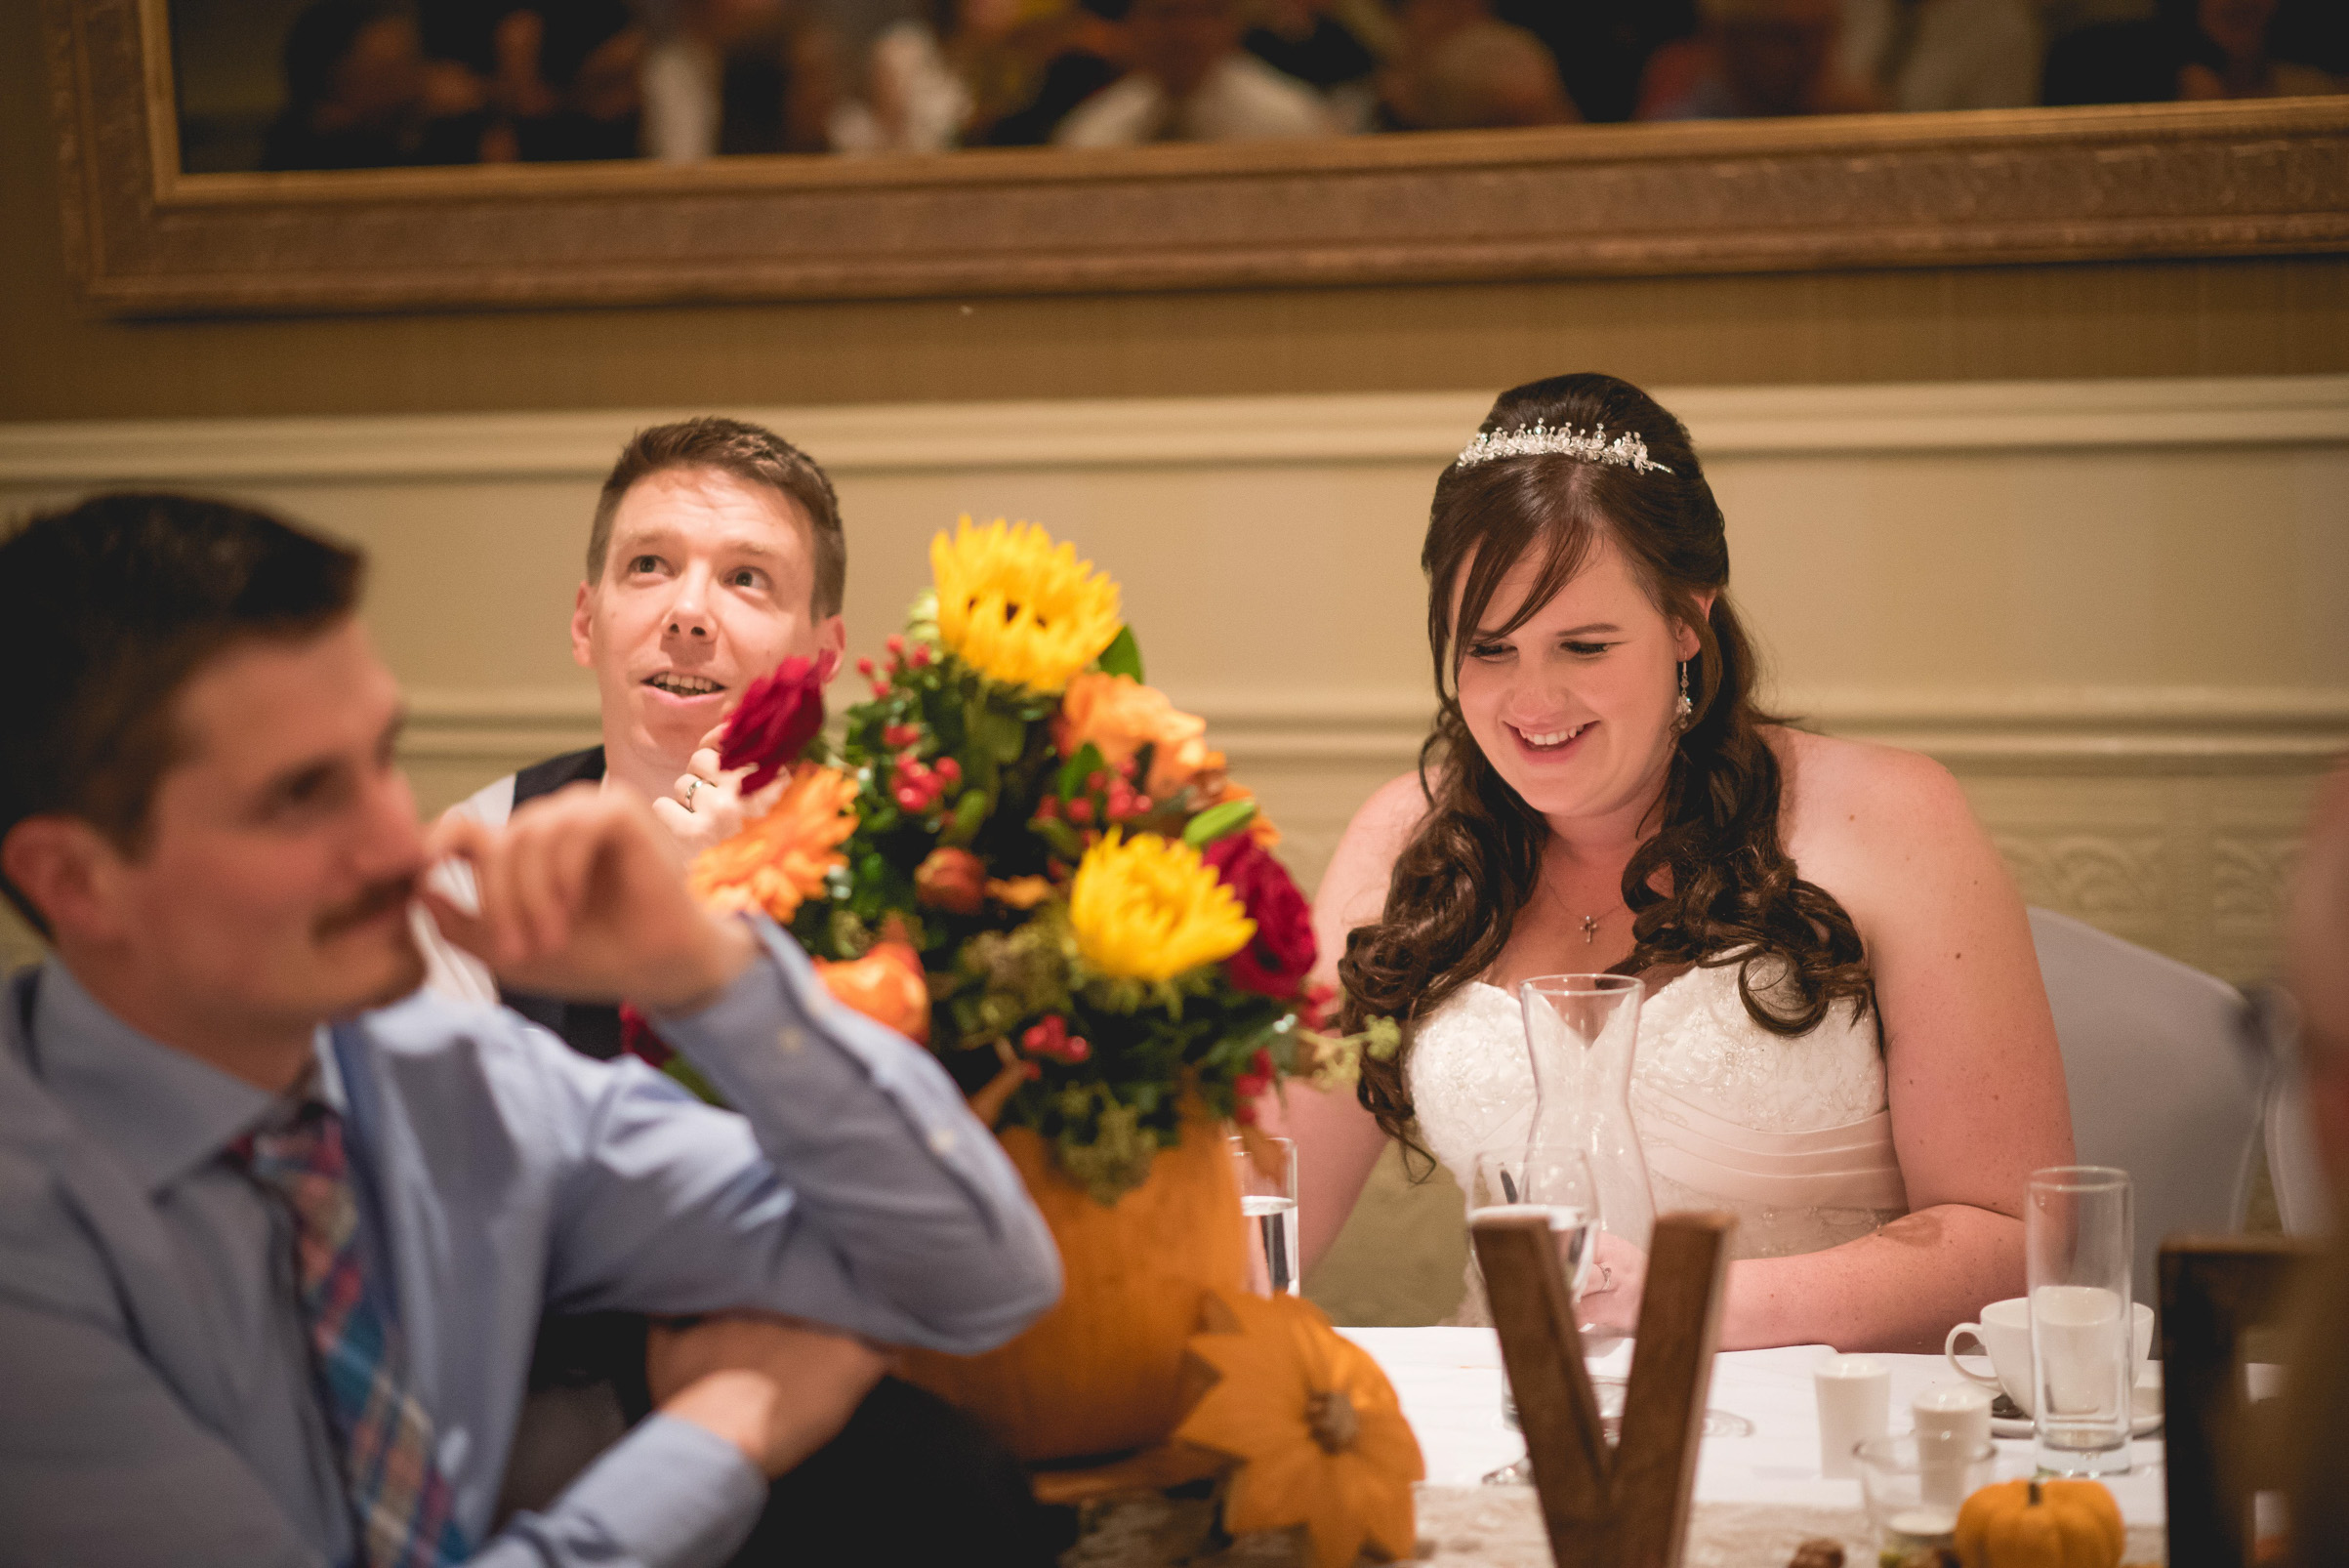 The+Fairlawns+wedding+Aldridge+StLukes+Church-180.jpg